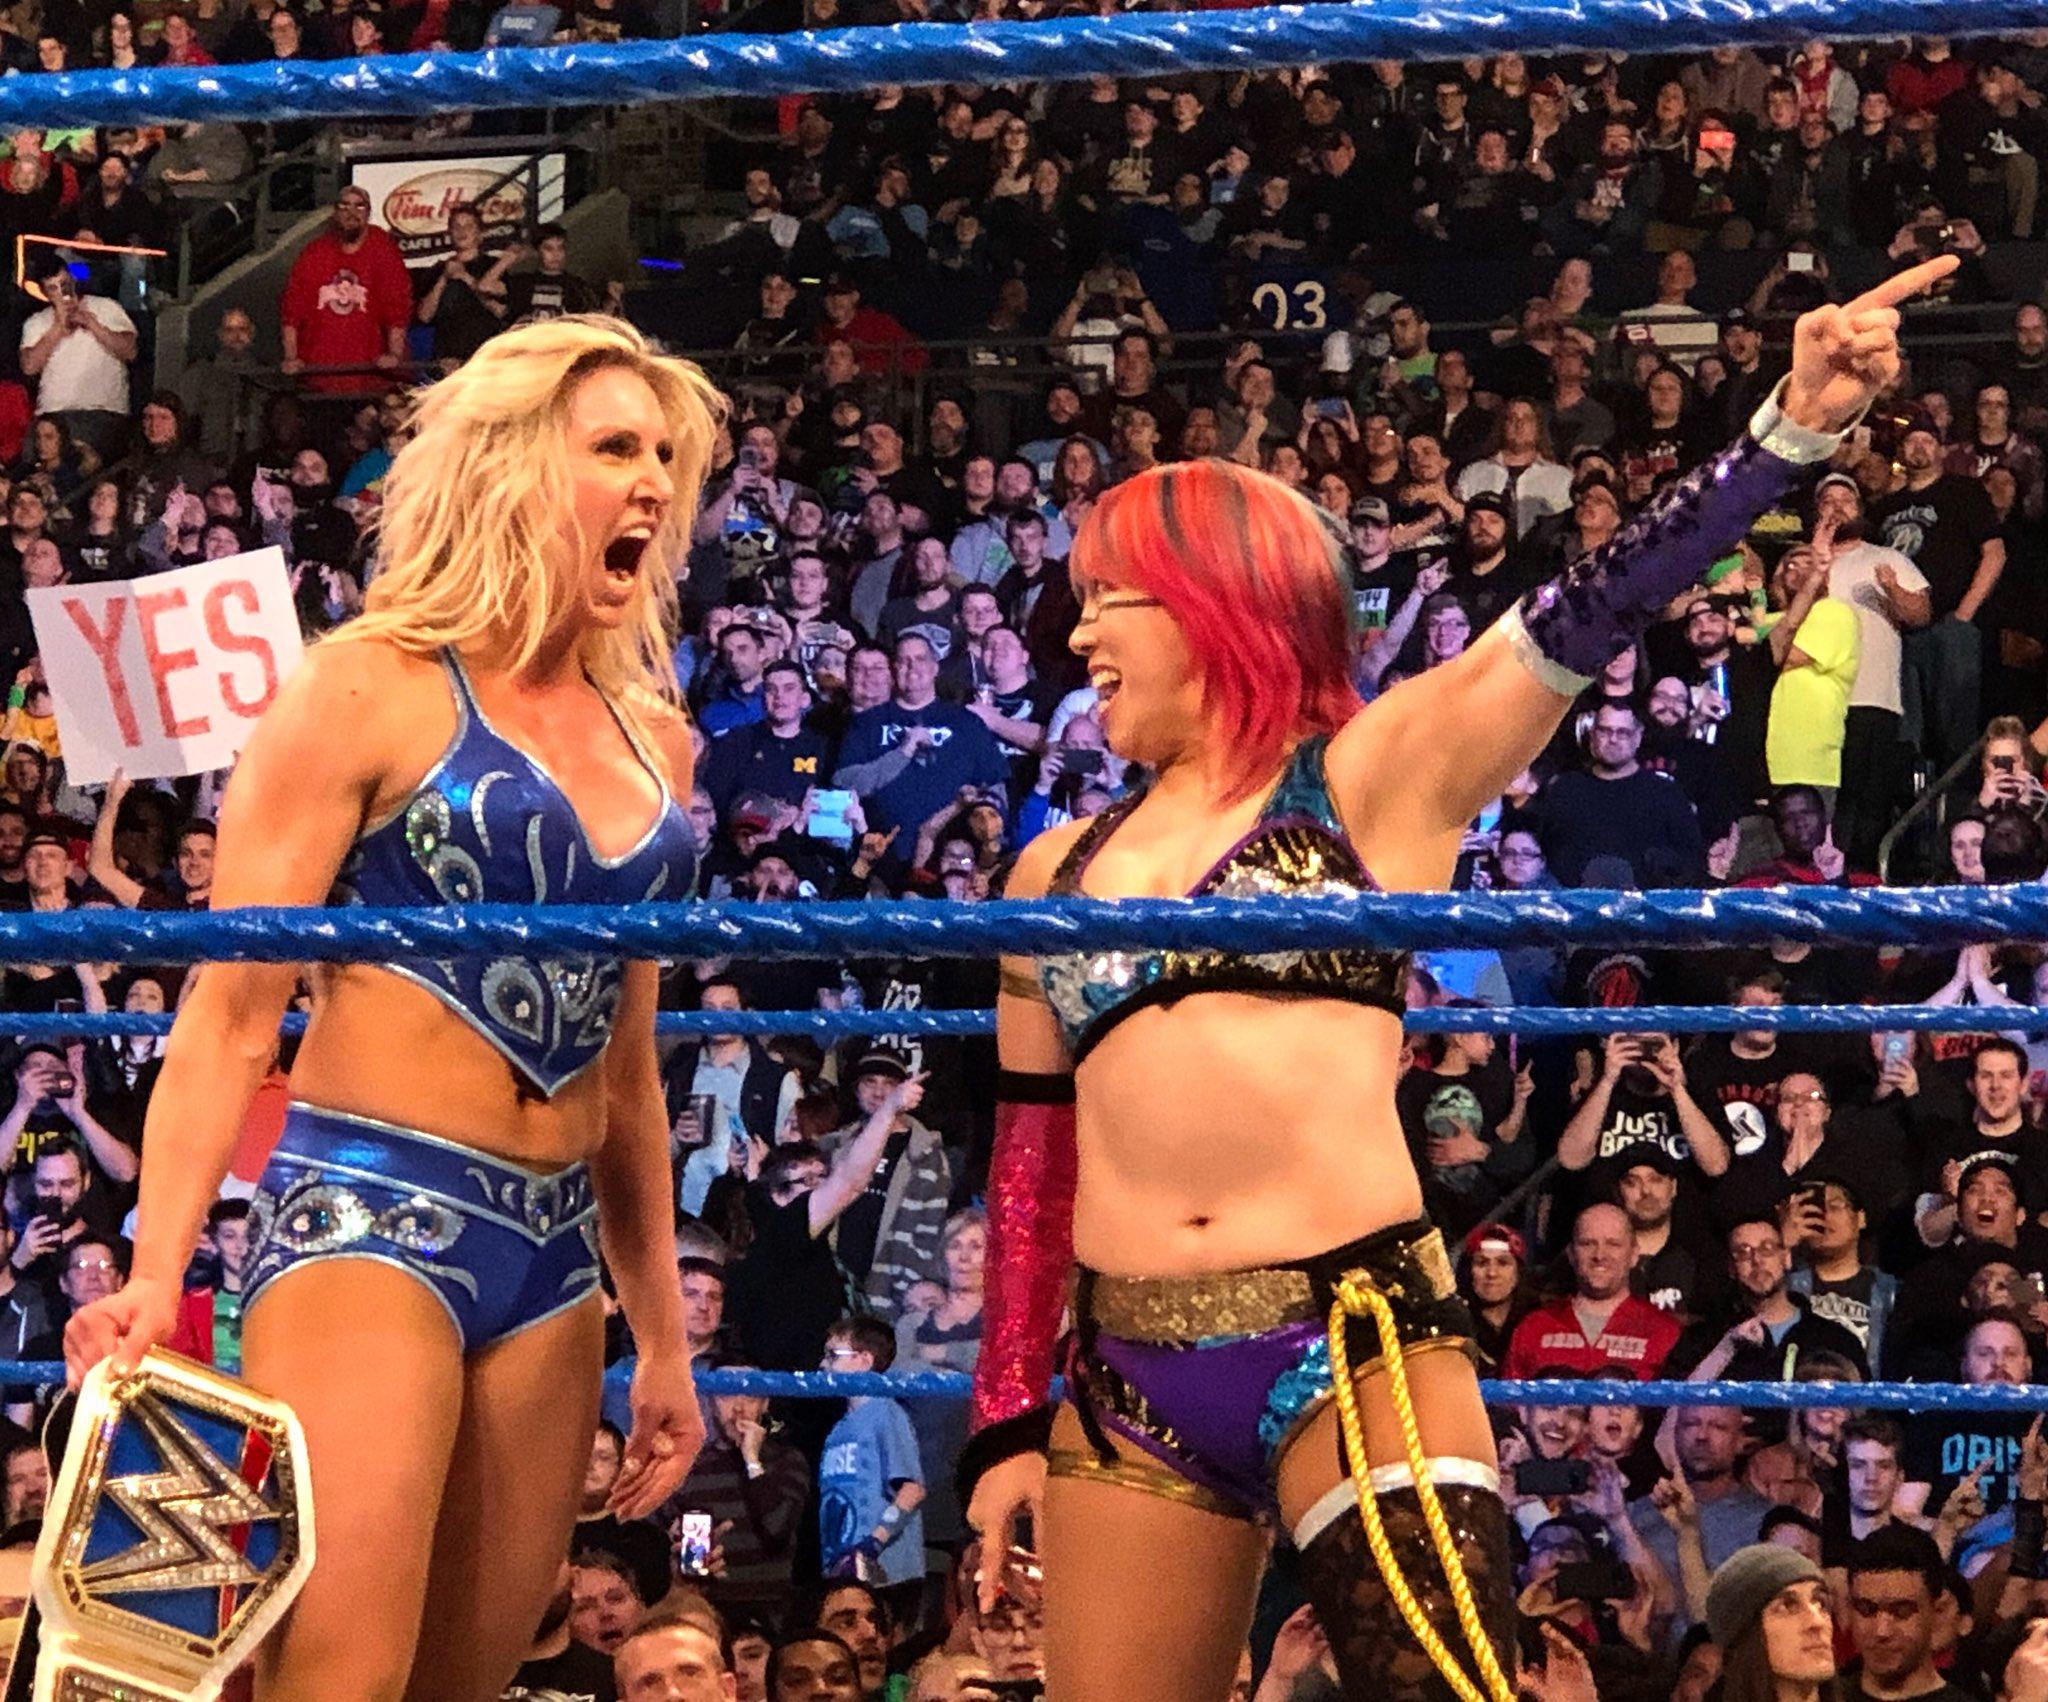 Asuka reta a la Campeona Femenil SmackDown, Charlotte Flair, a una lucha en WrestleMania 34 (11/03/2018) / WWE©